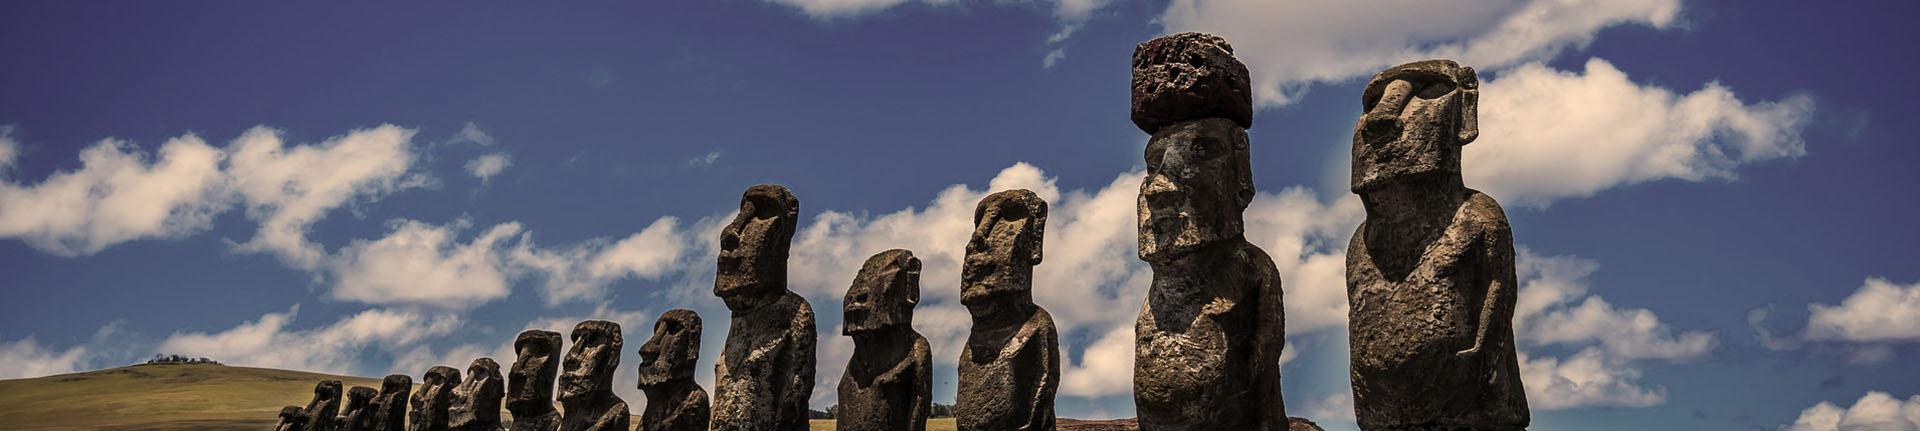 Ilha de Páscoa, destino educativo e histórico